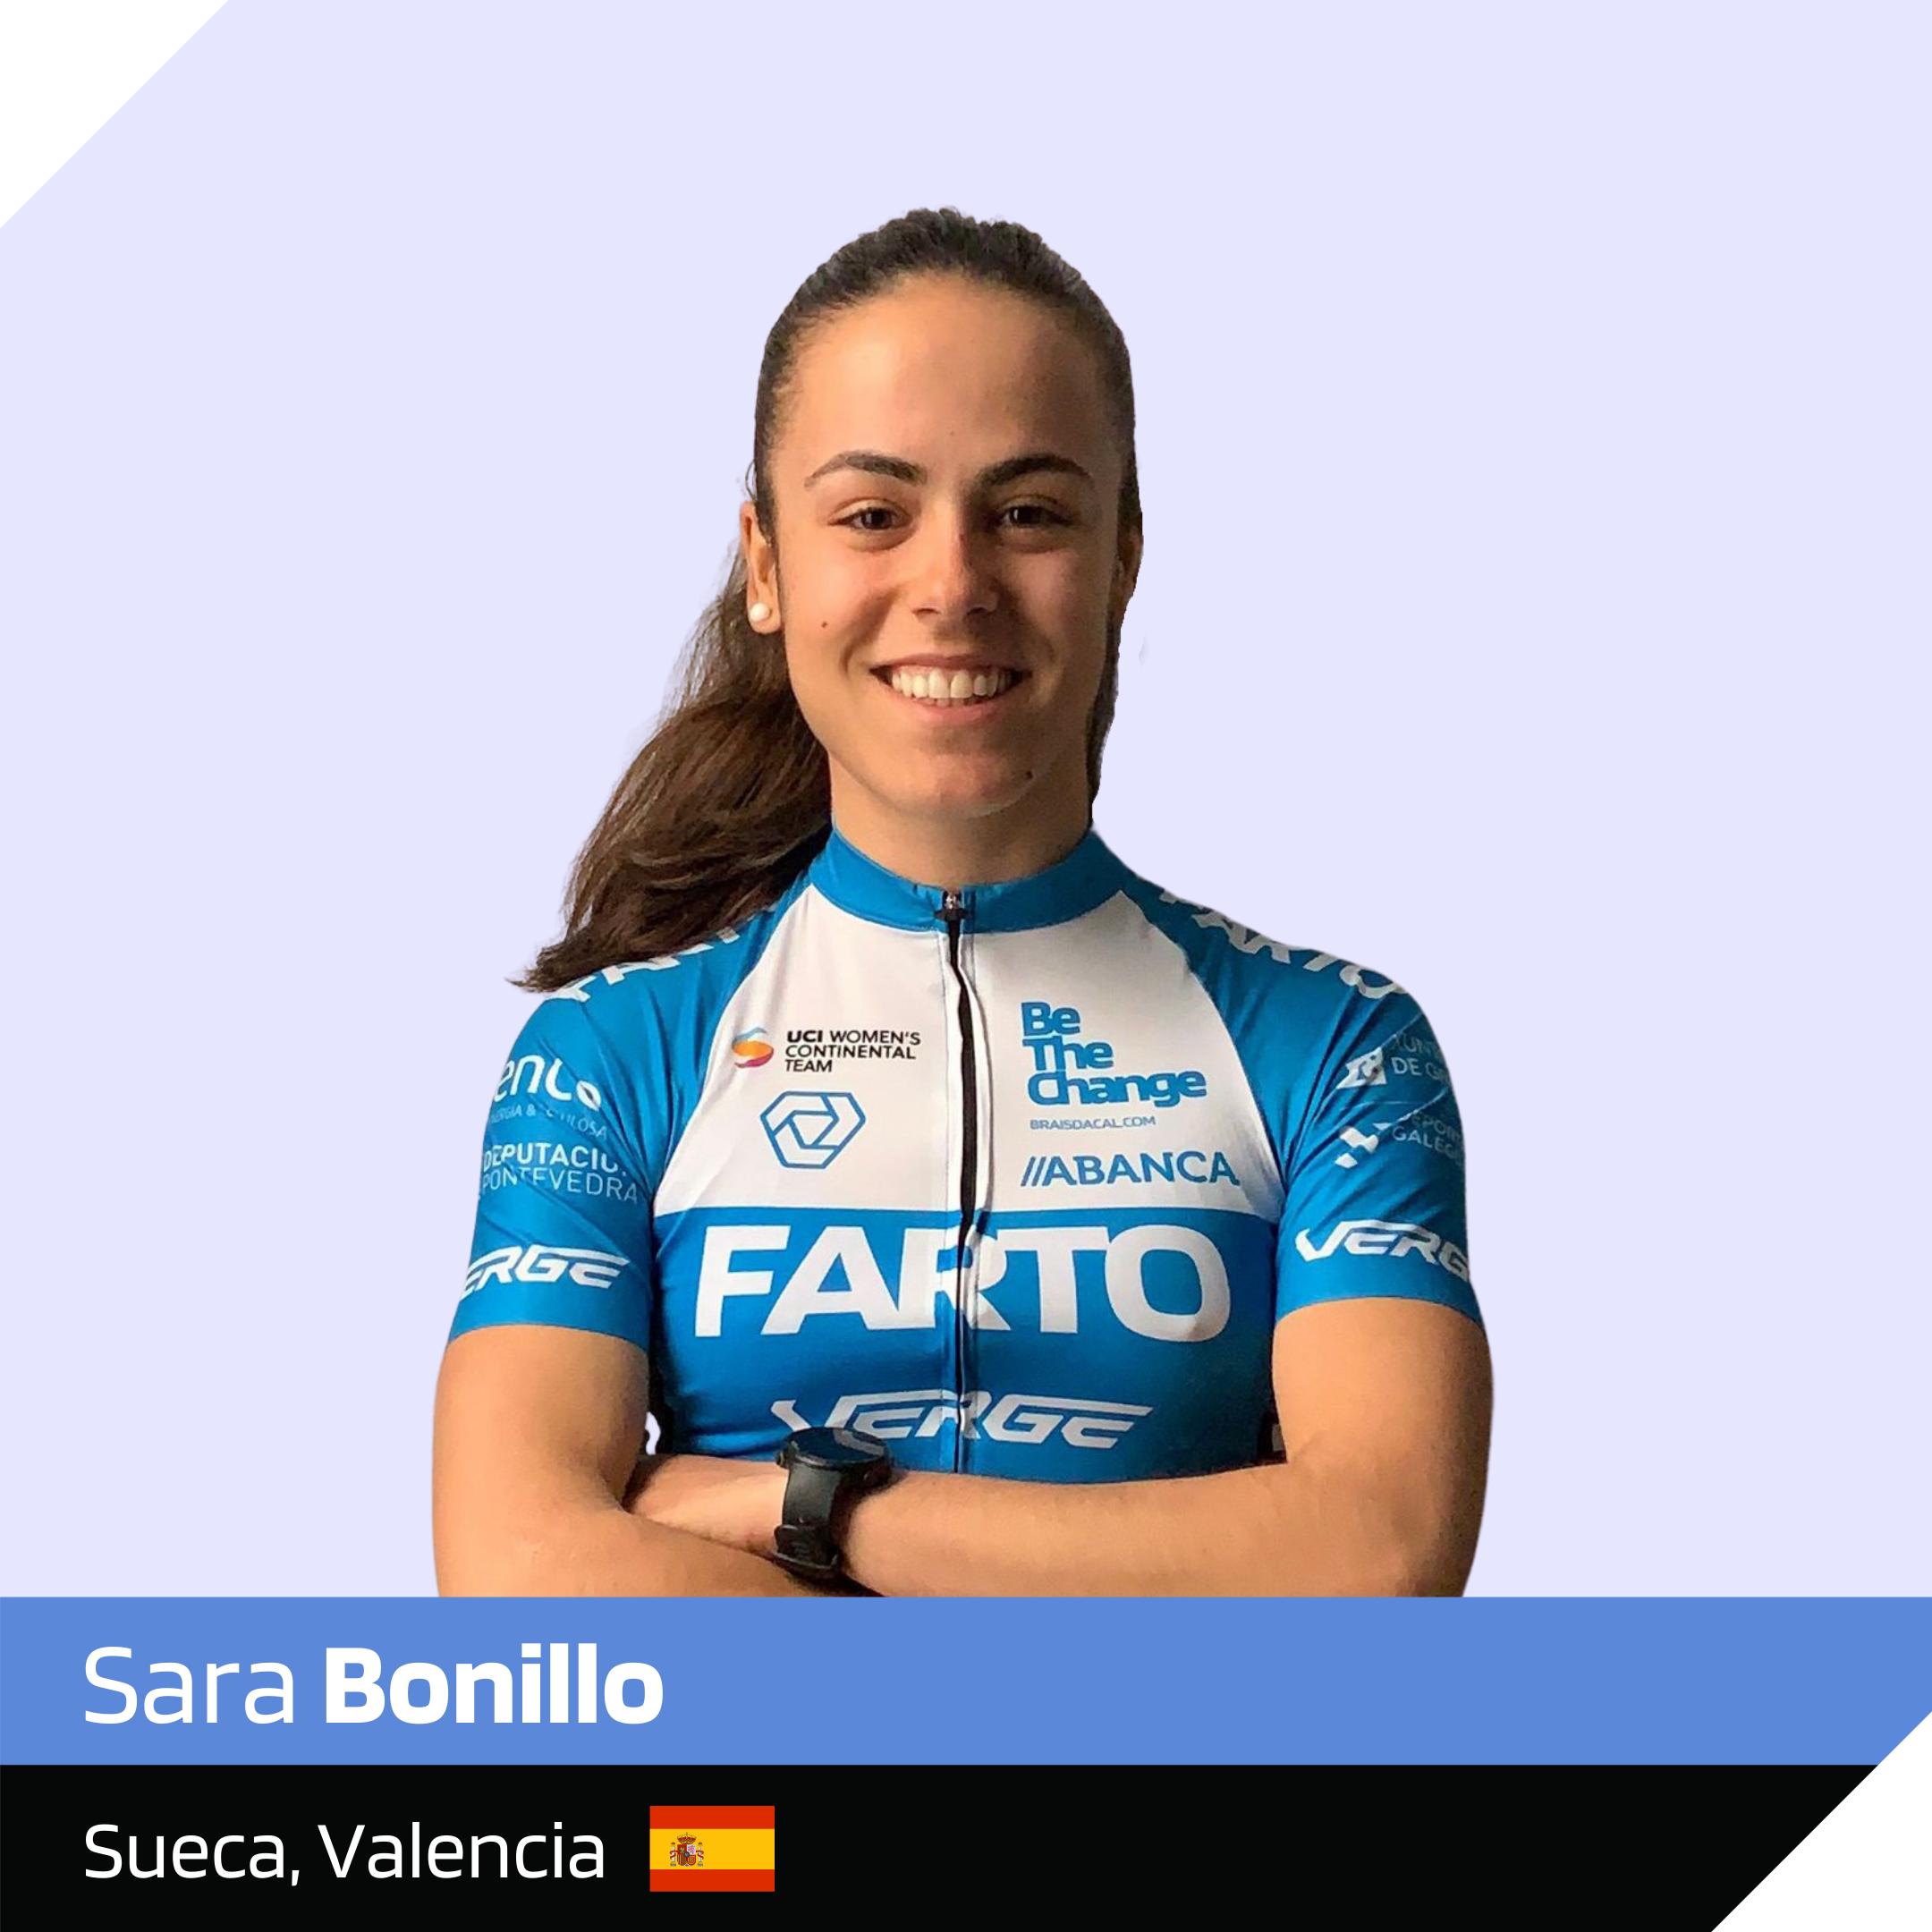 Sara Bonillo